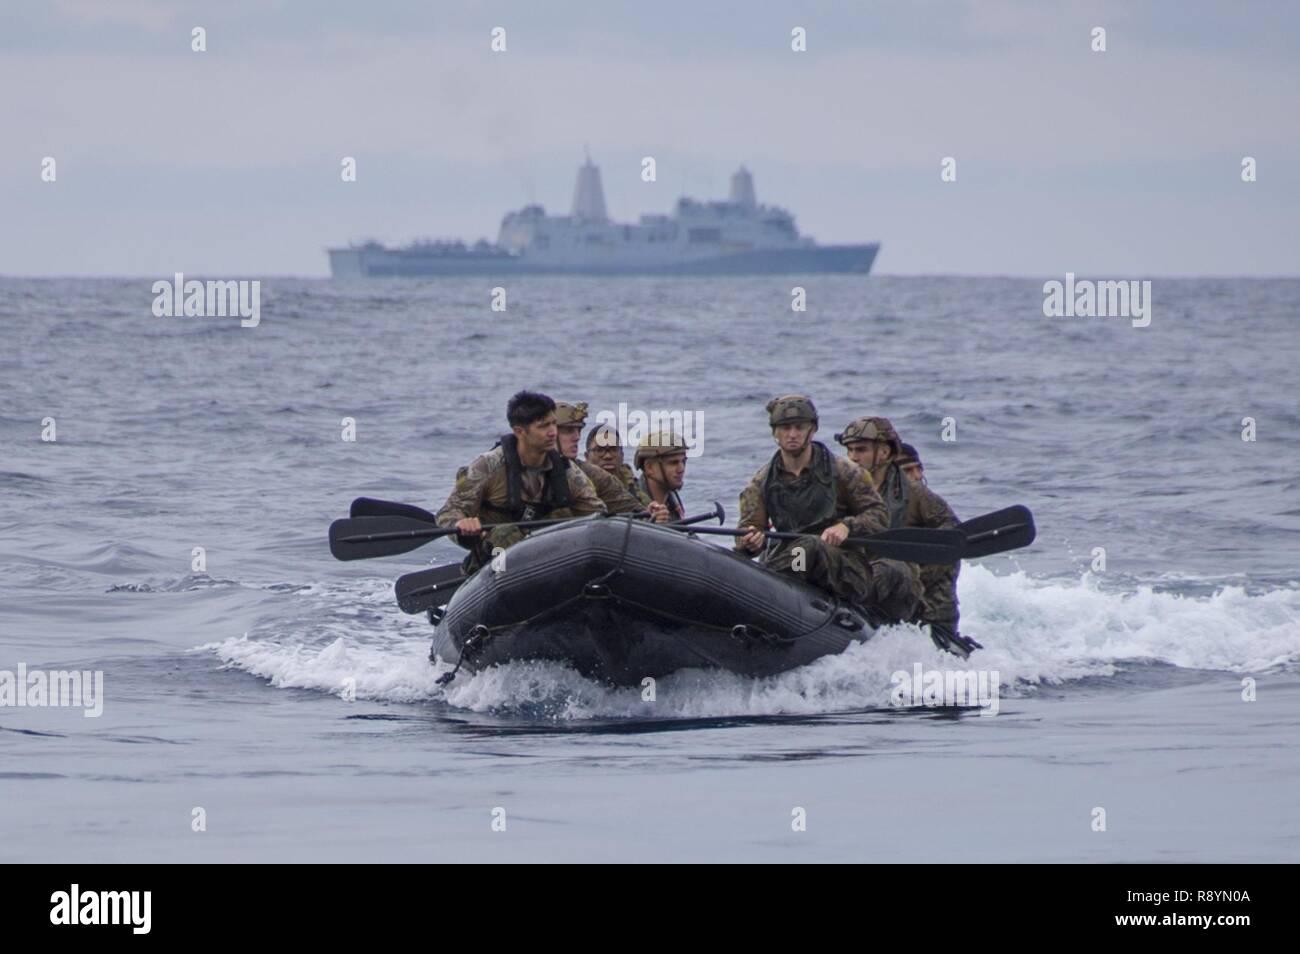 PHILIPPINE SEA (March 19, 2017) Reconnaissance Marines